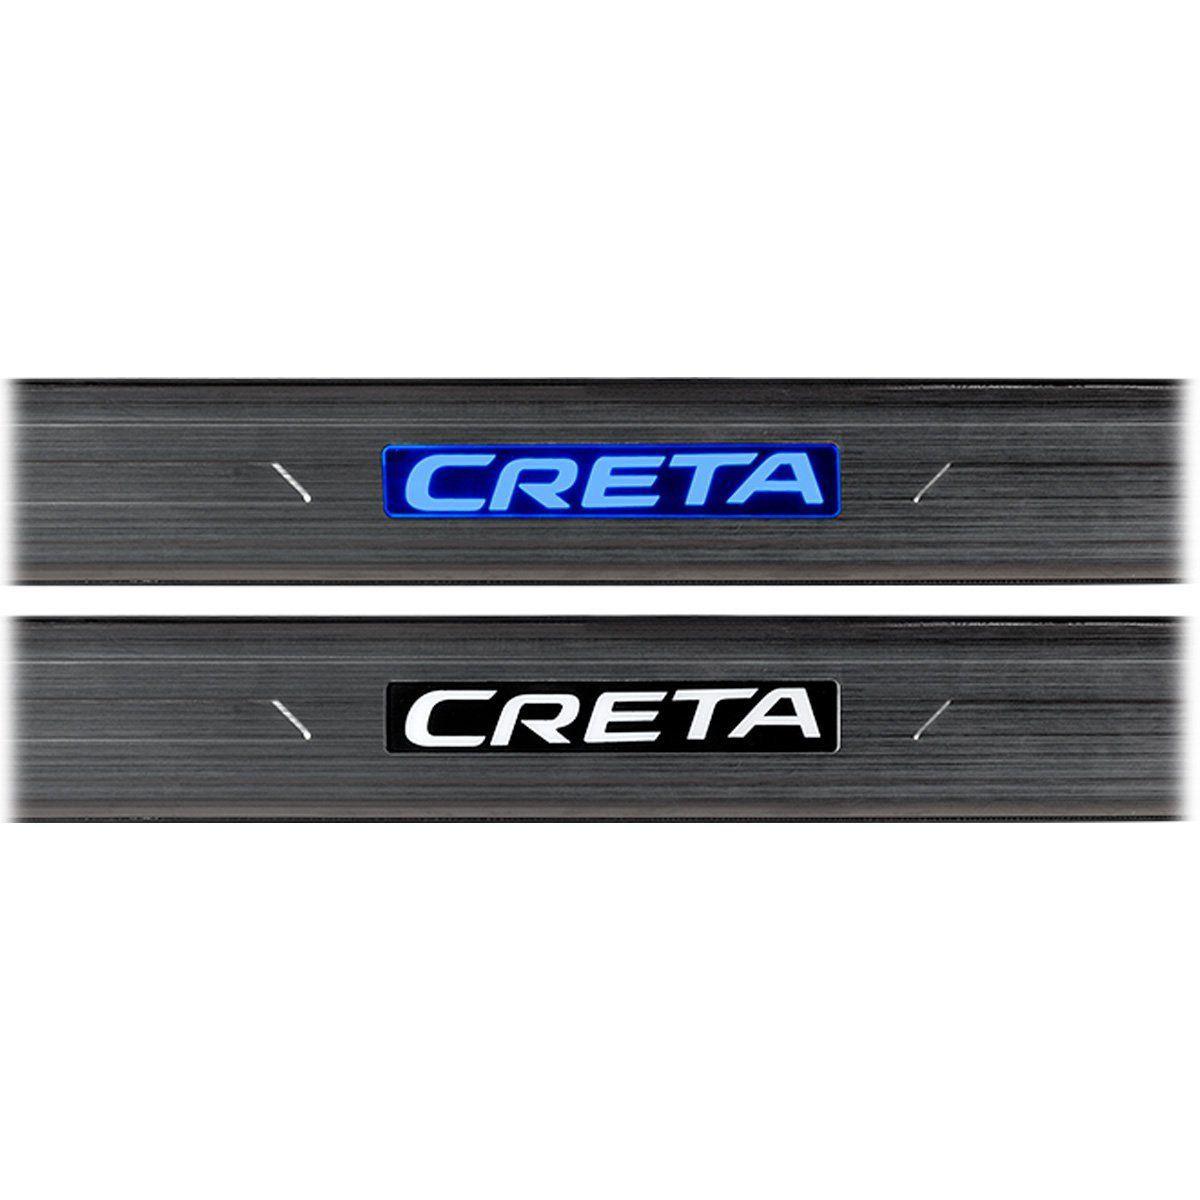 Kit Soleira de Porta C/ LED Creta 2017 2018 Inox Iluminada